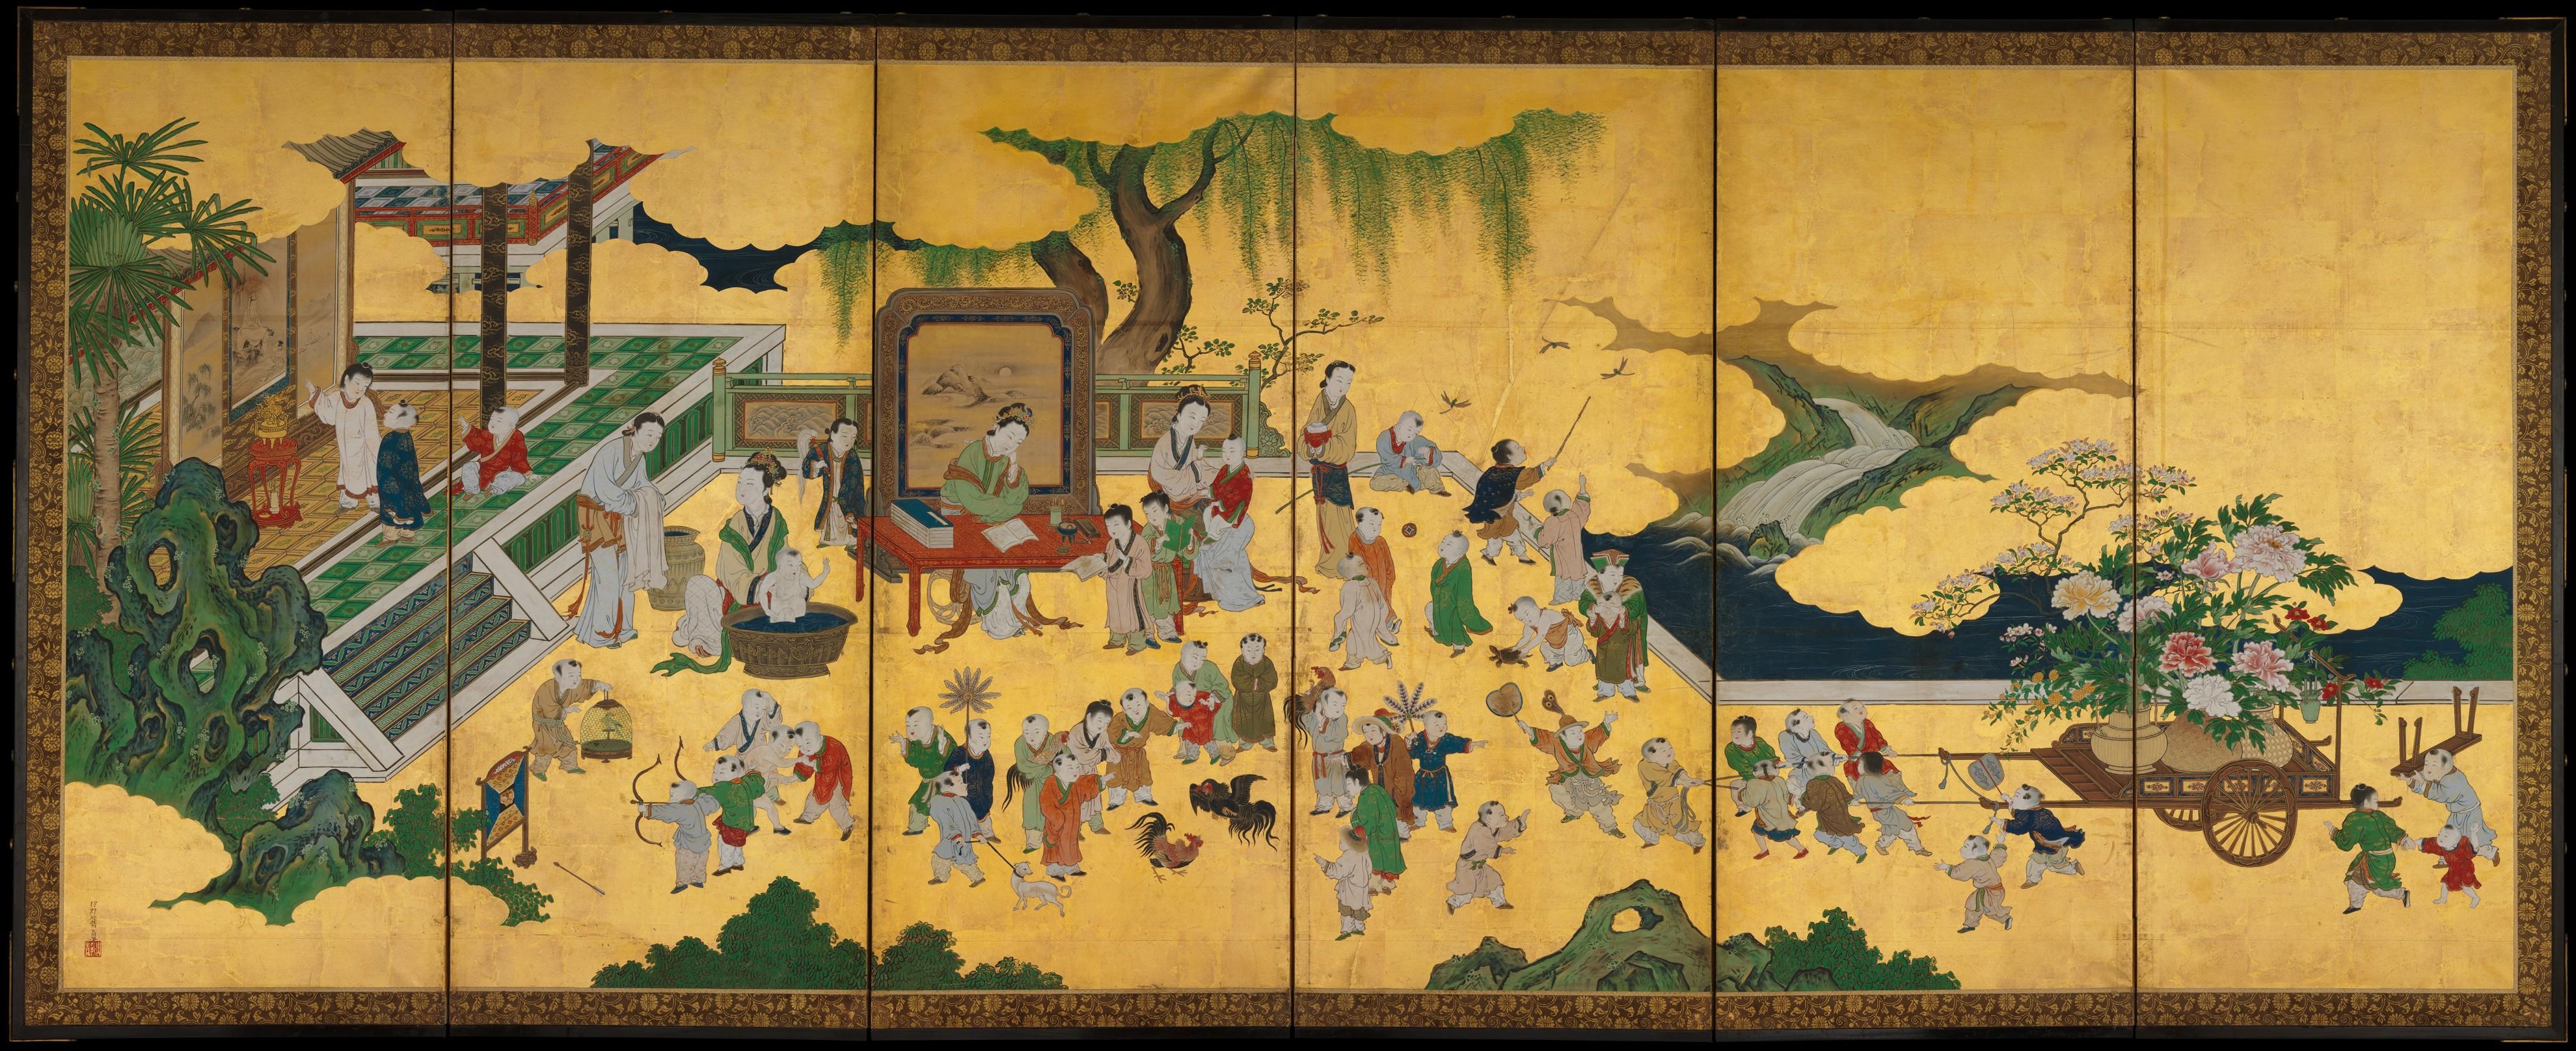 Kano Einō | One Hundred Boys | Japan | Edo period (1615–1868) | The Met